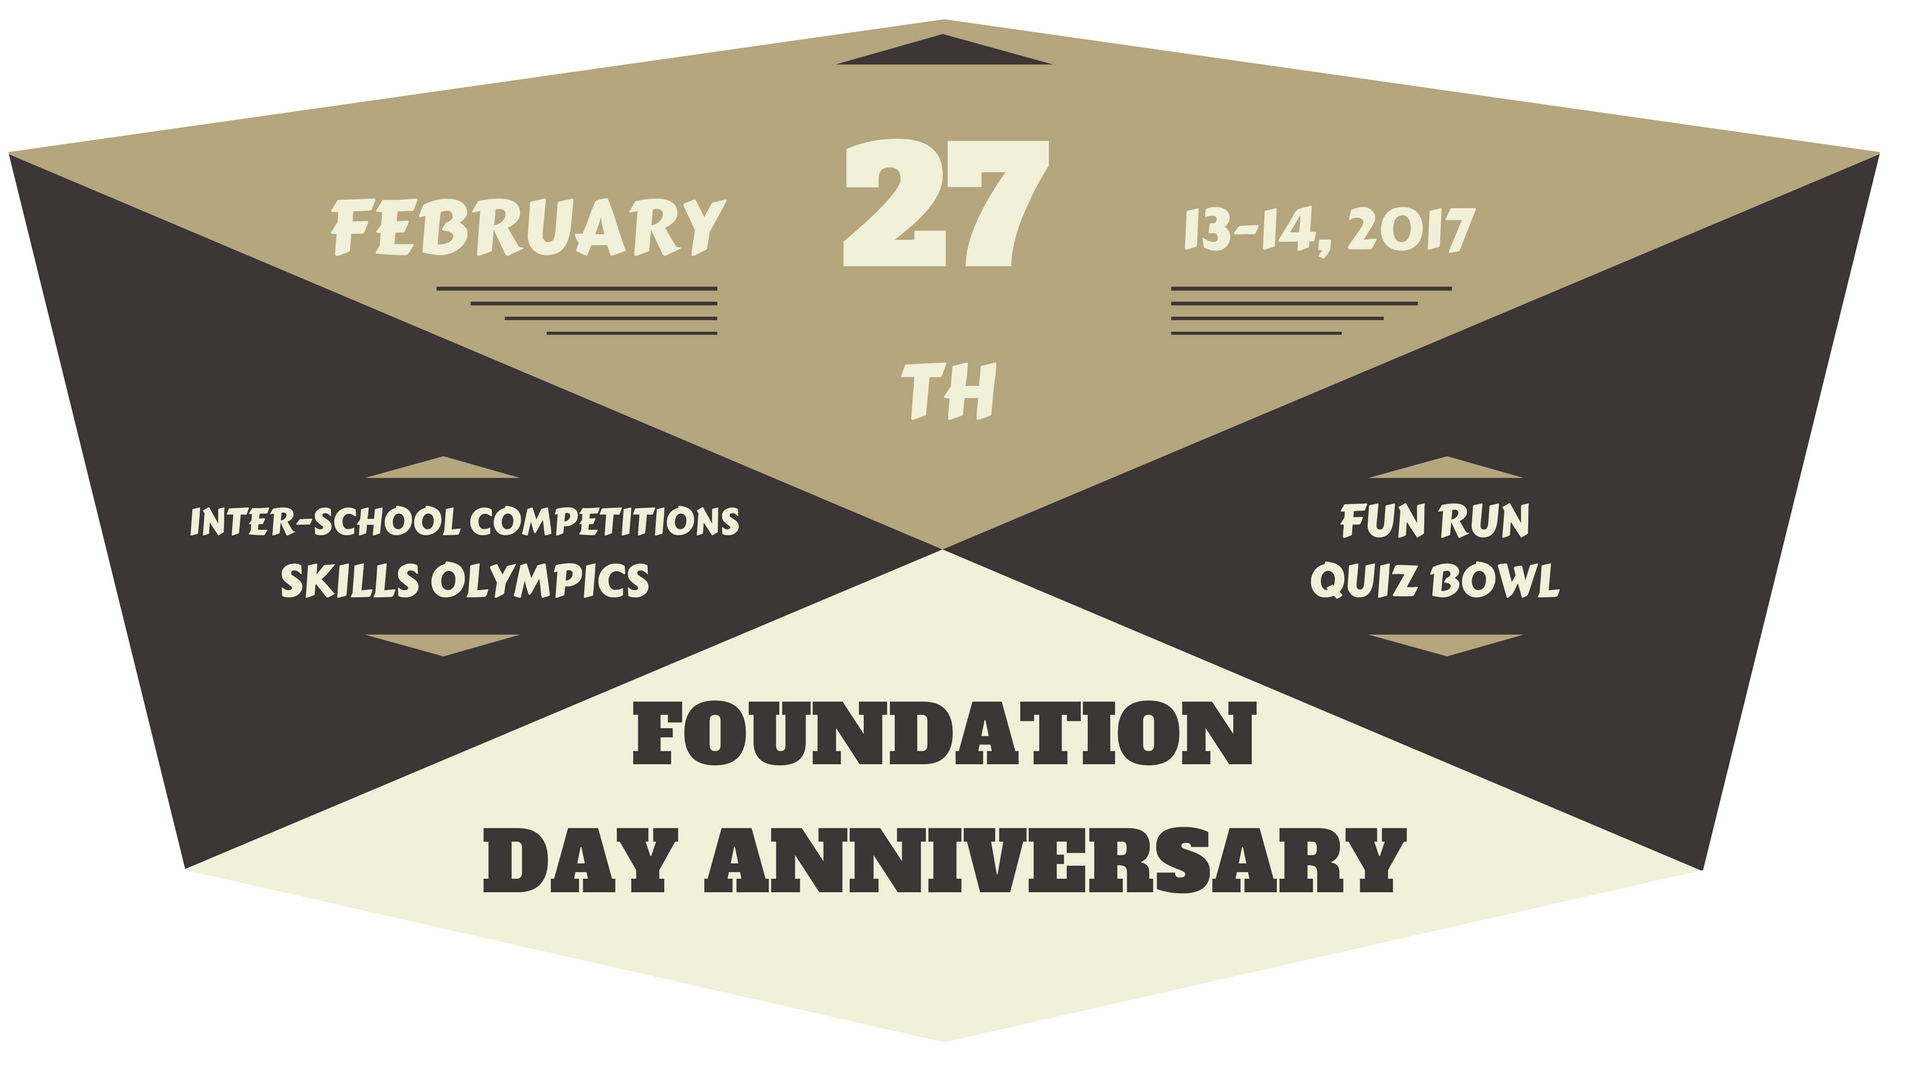 FOUNDATION DAY (1)